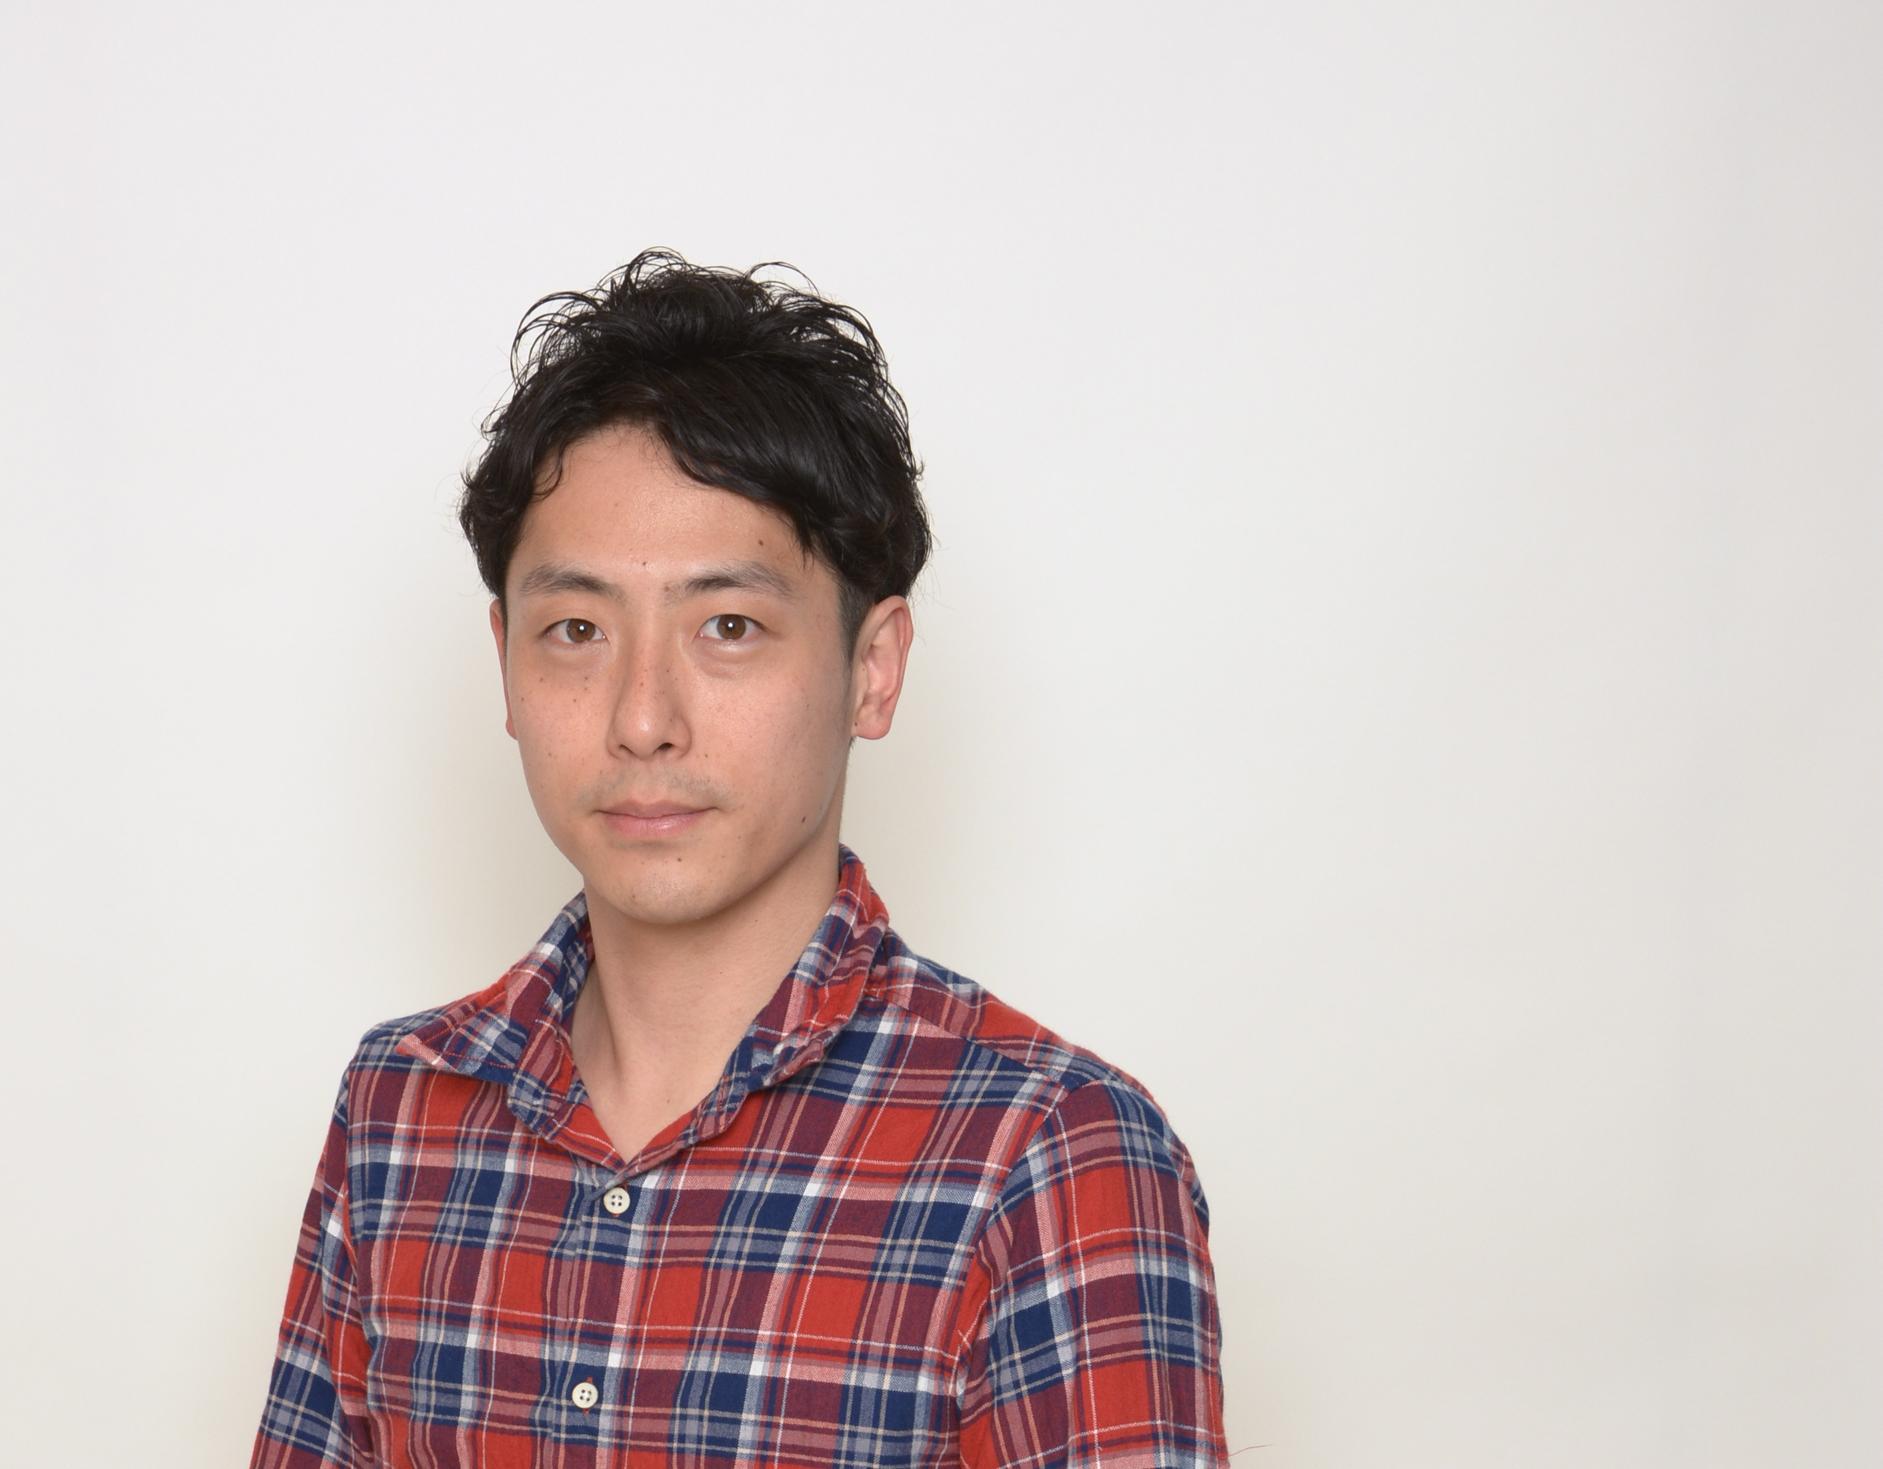 https://enterprise.cybozu.co.jp/000139%20%282%29.jpg